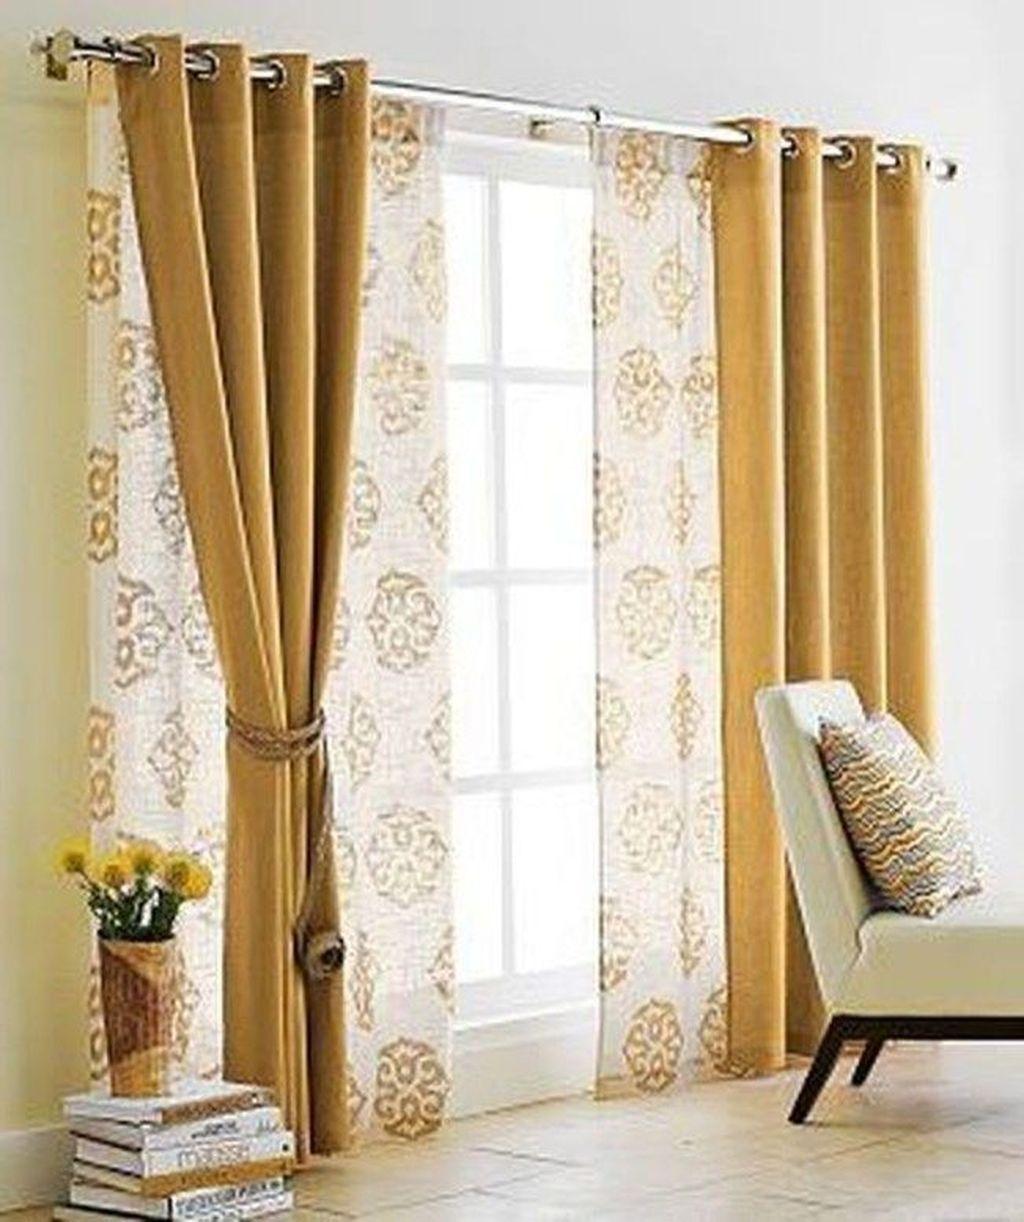 35 Pretty Living Room Curtain Design Ideas For Cozy Place Curtains Living Room Pretty Living Room Home Living Room #pretty #curtains #for #living #room